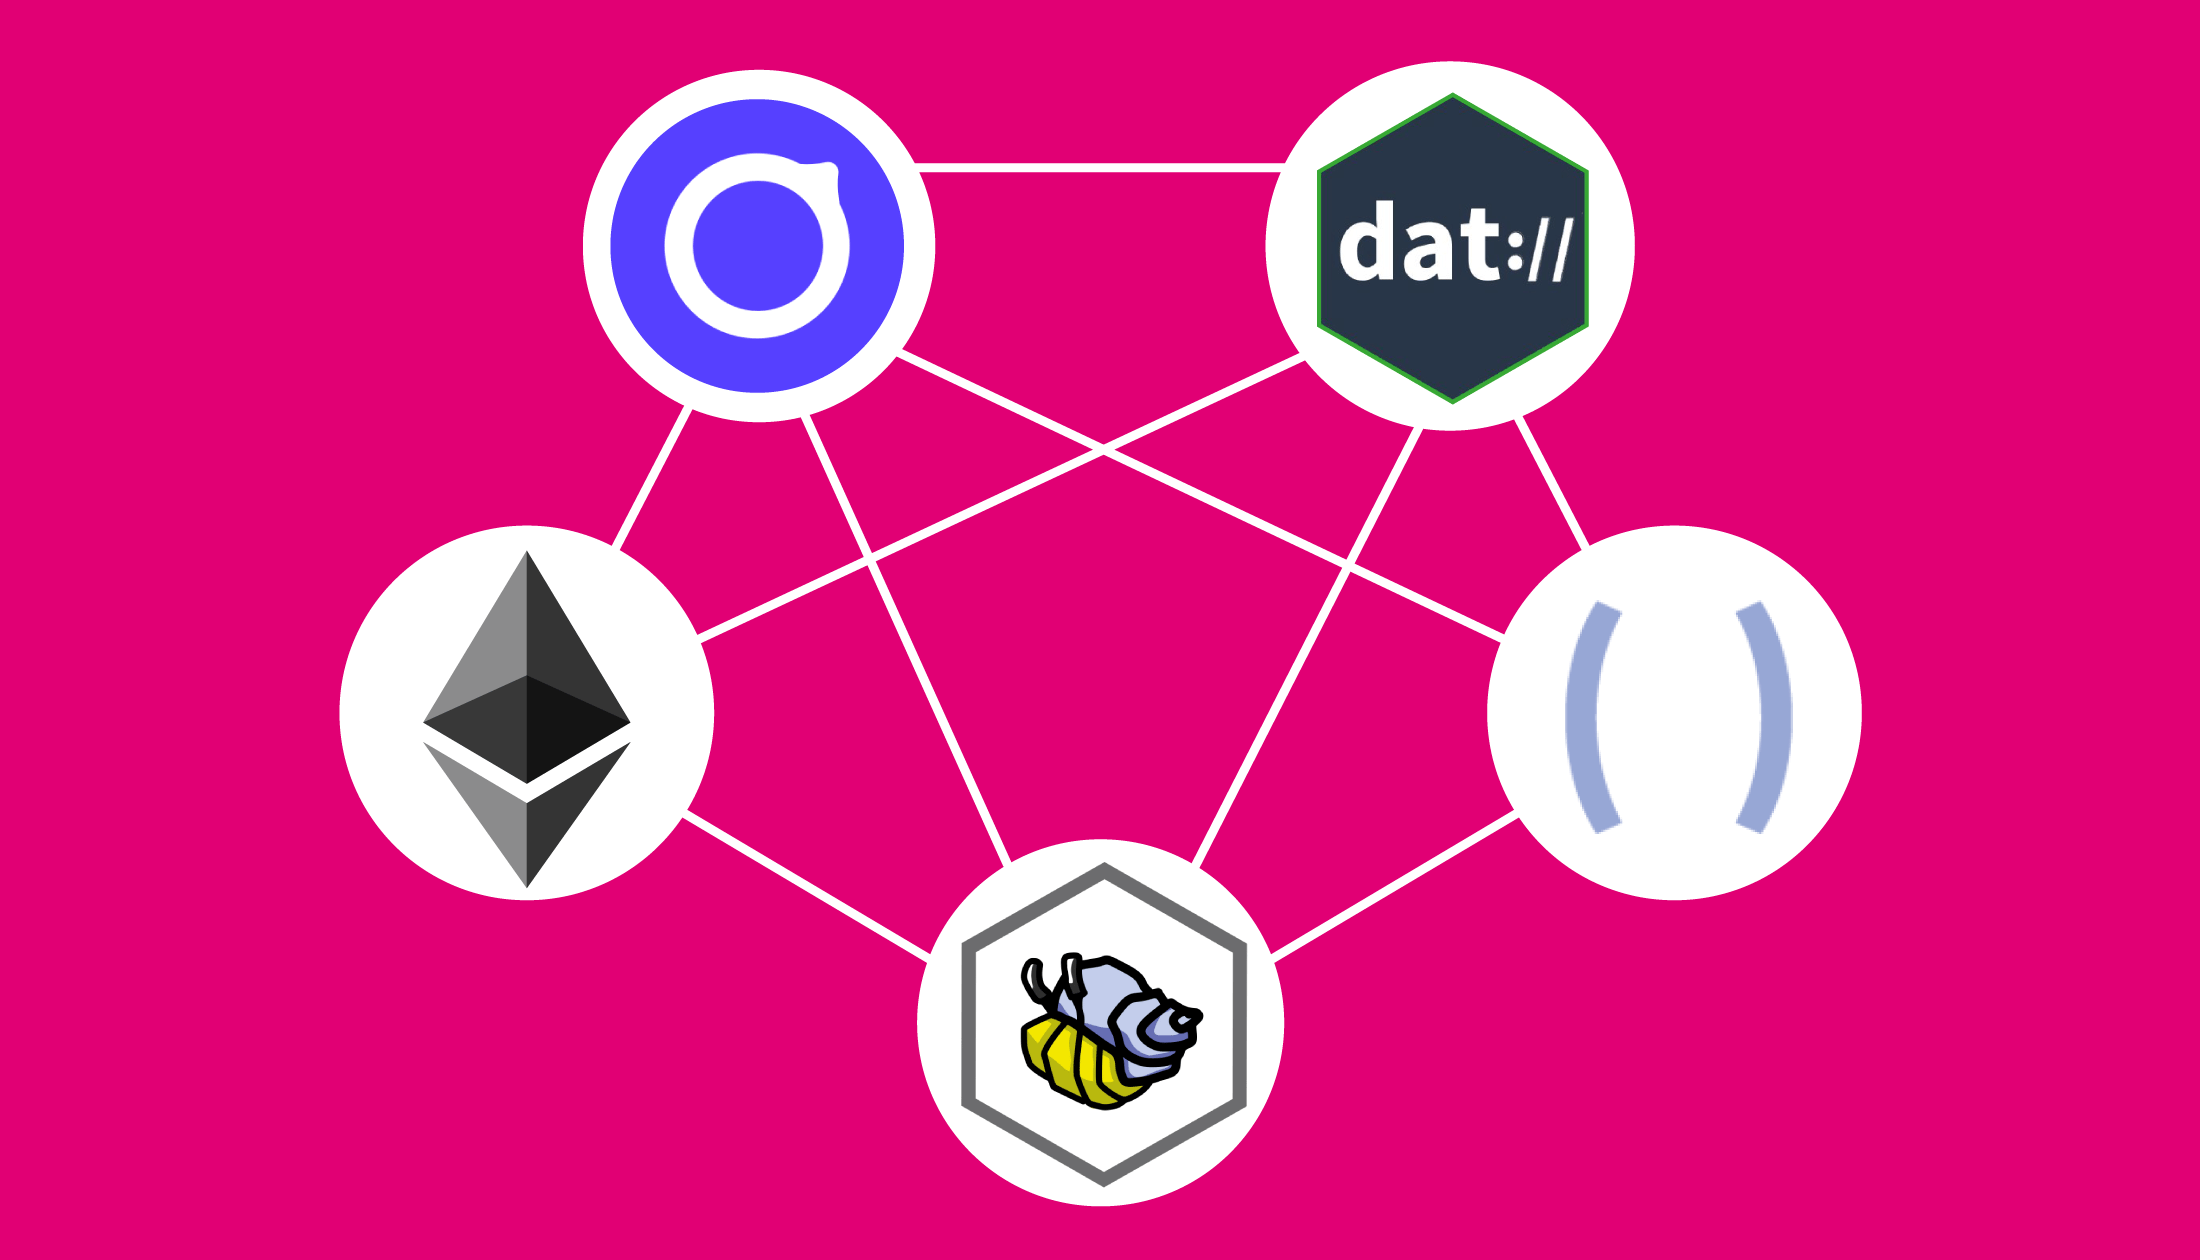 decentralized internet